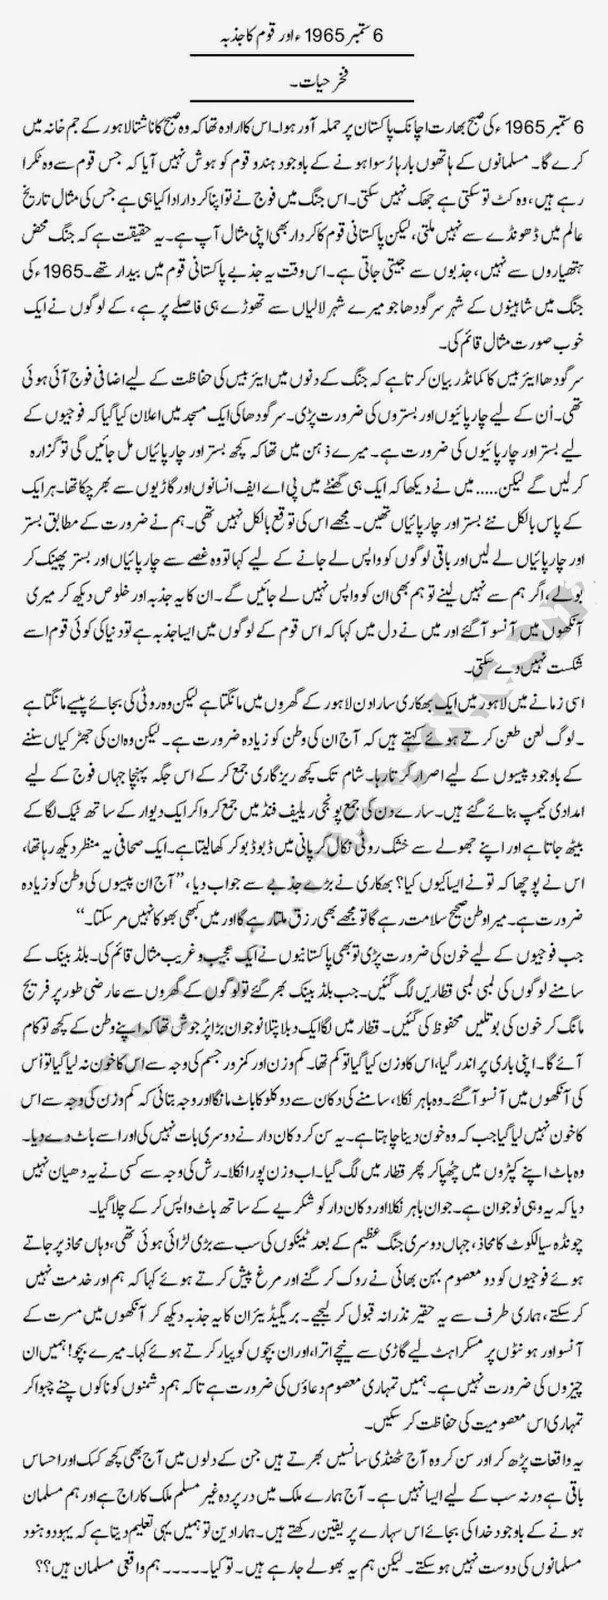 Pakistan Defence Day Youm-e-Difa 6 September 1965 – Virtualians Social Network